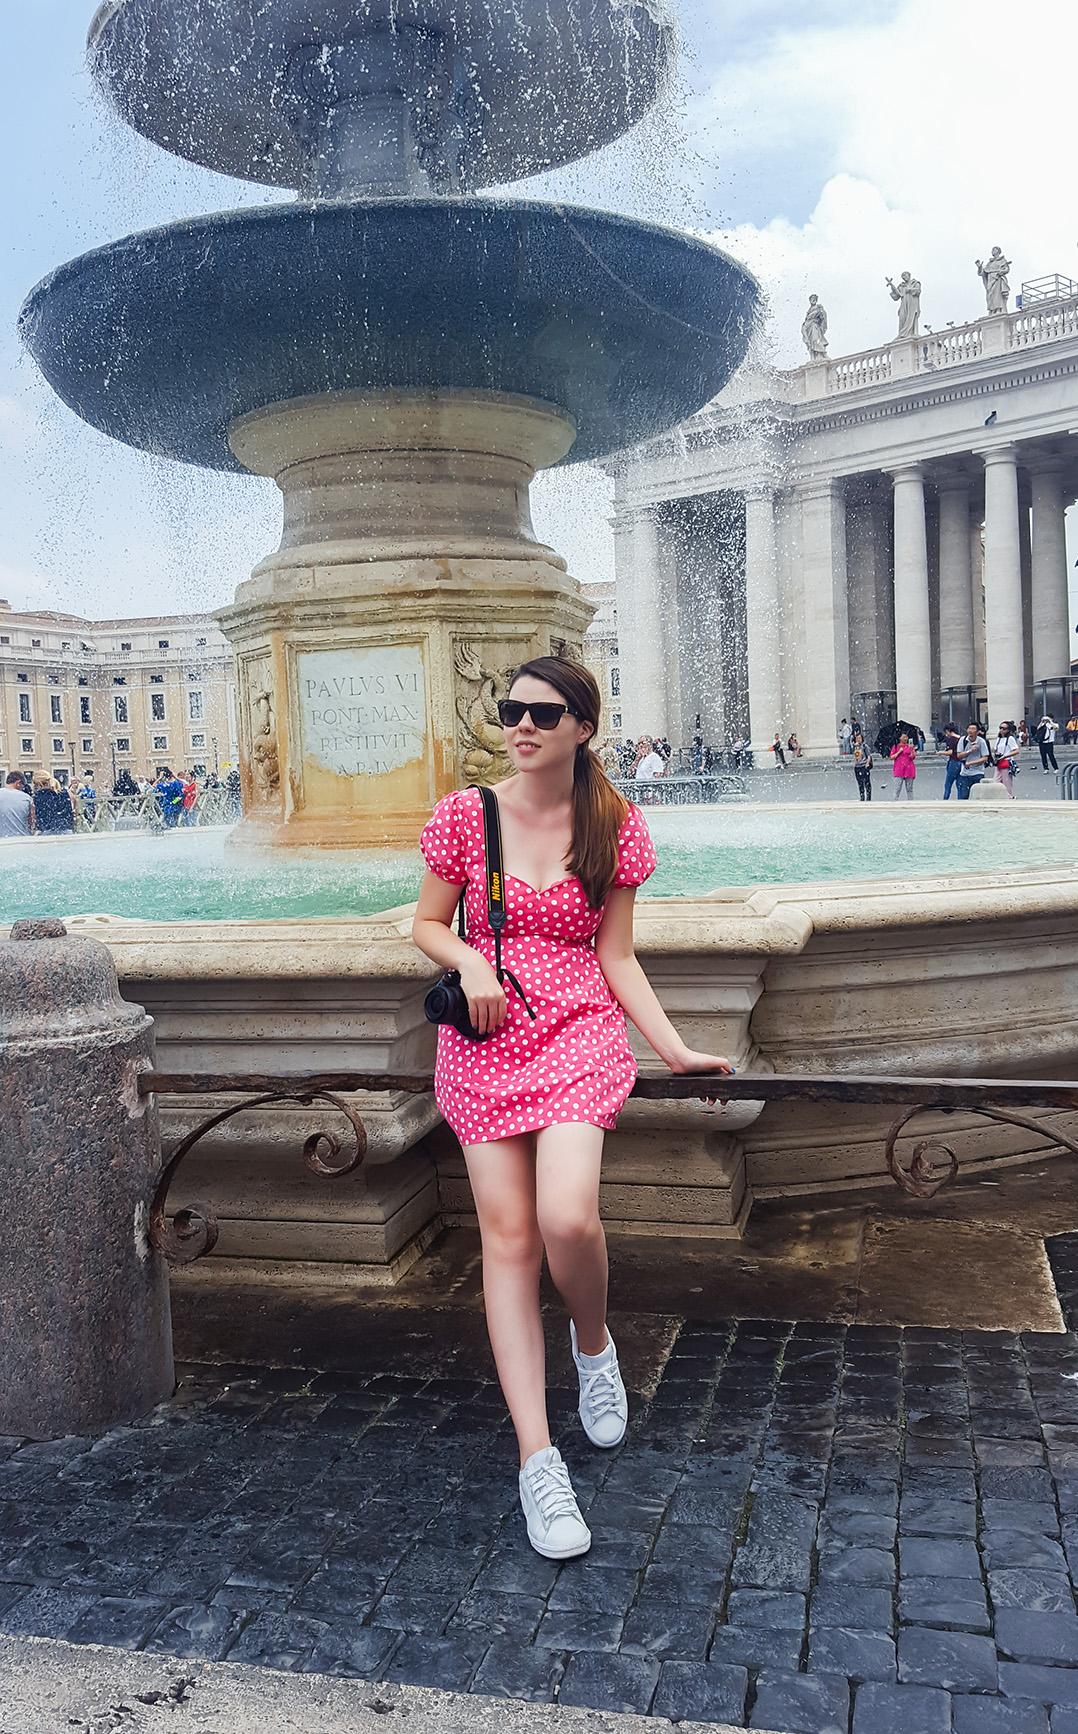 vatican-fountain